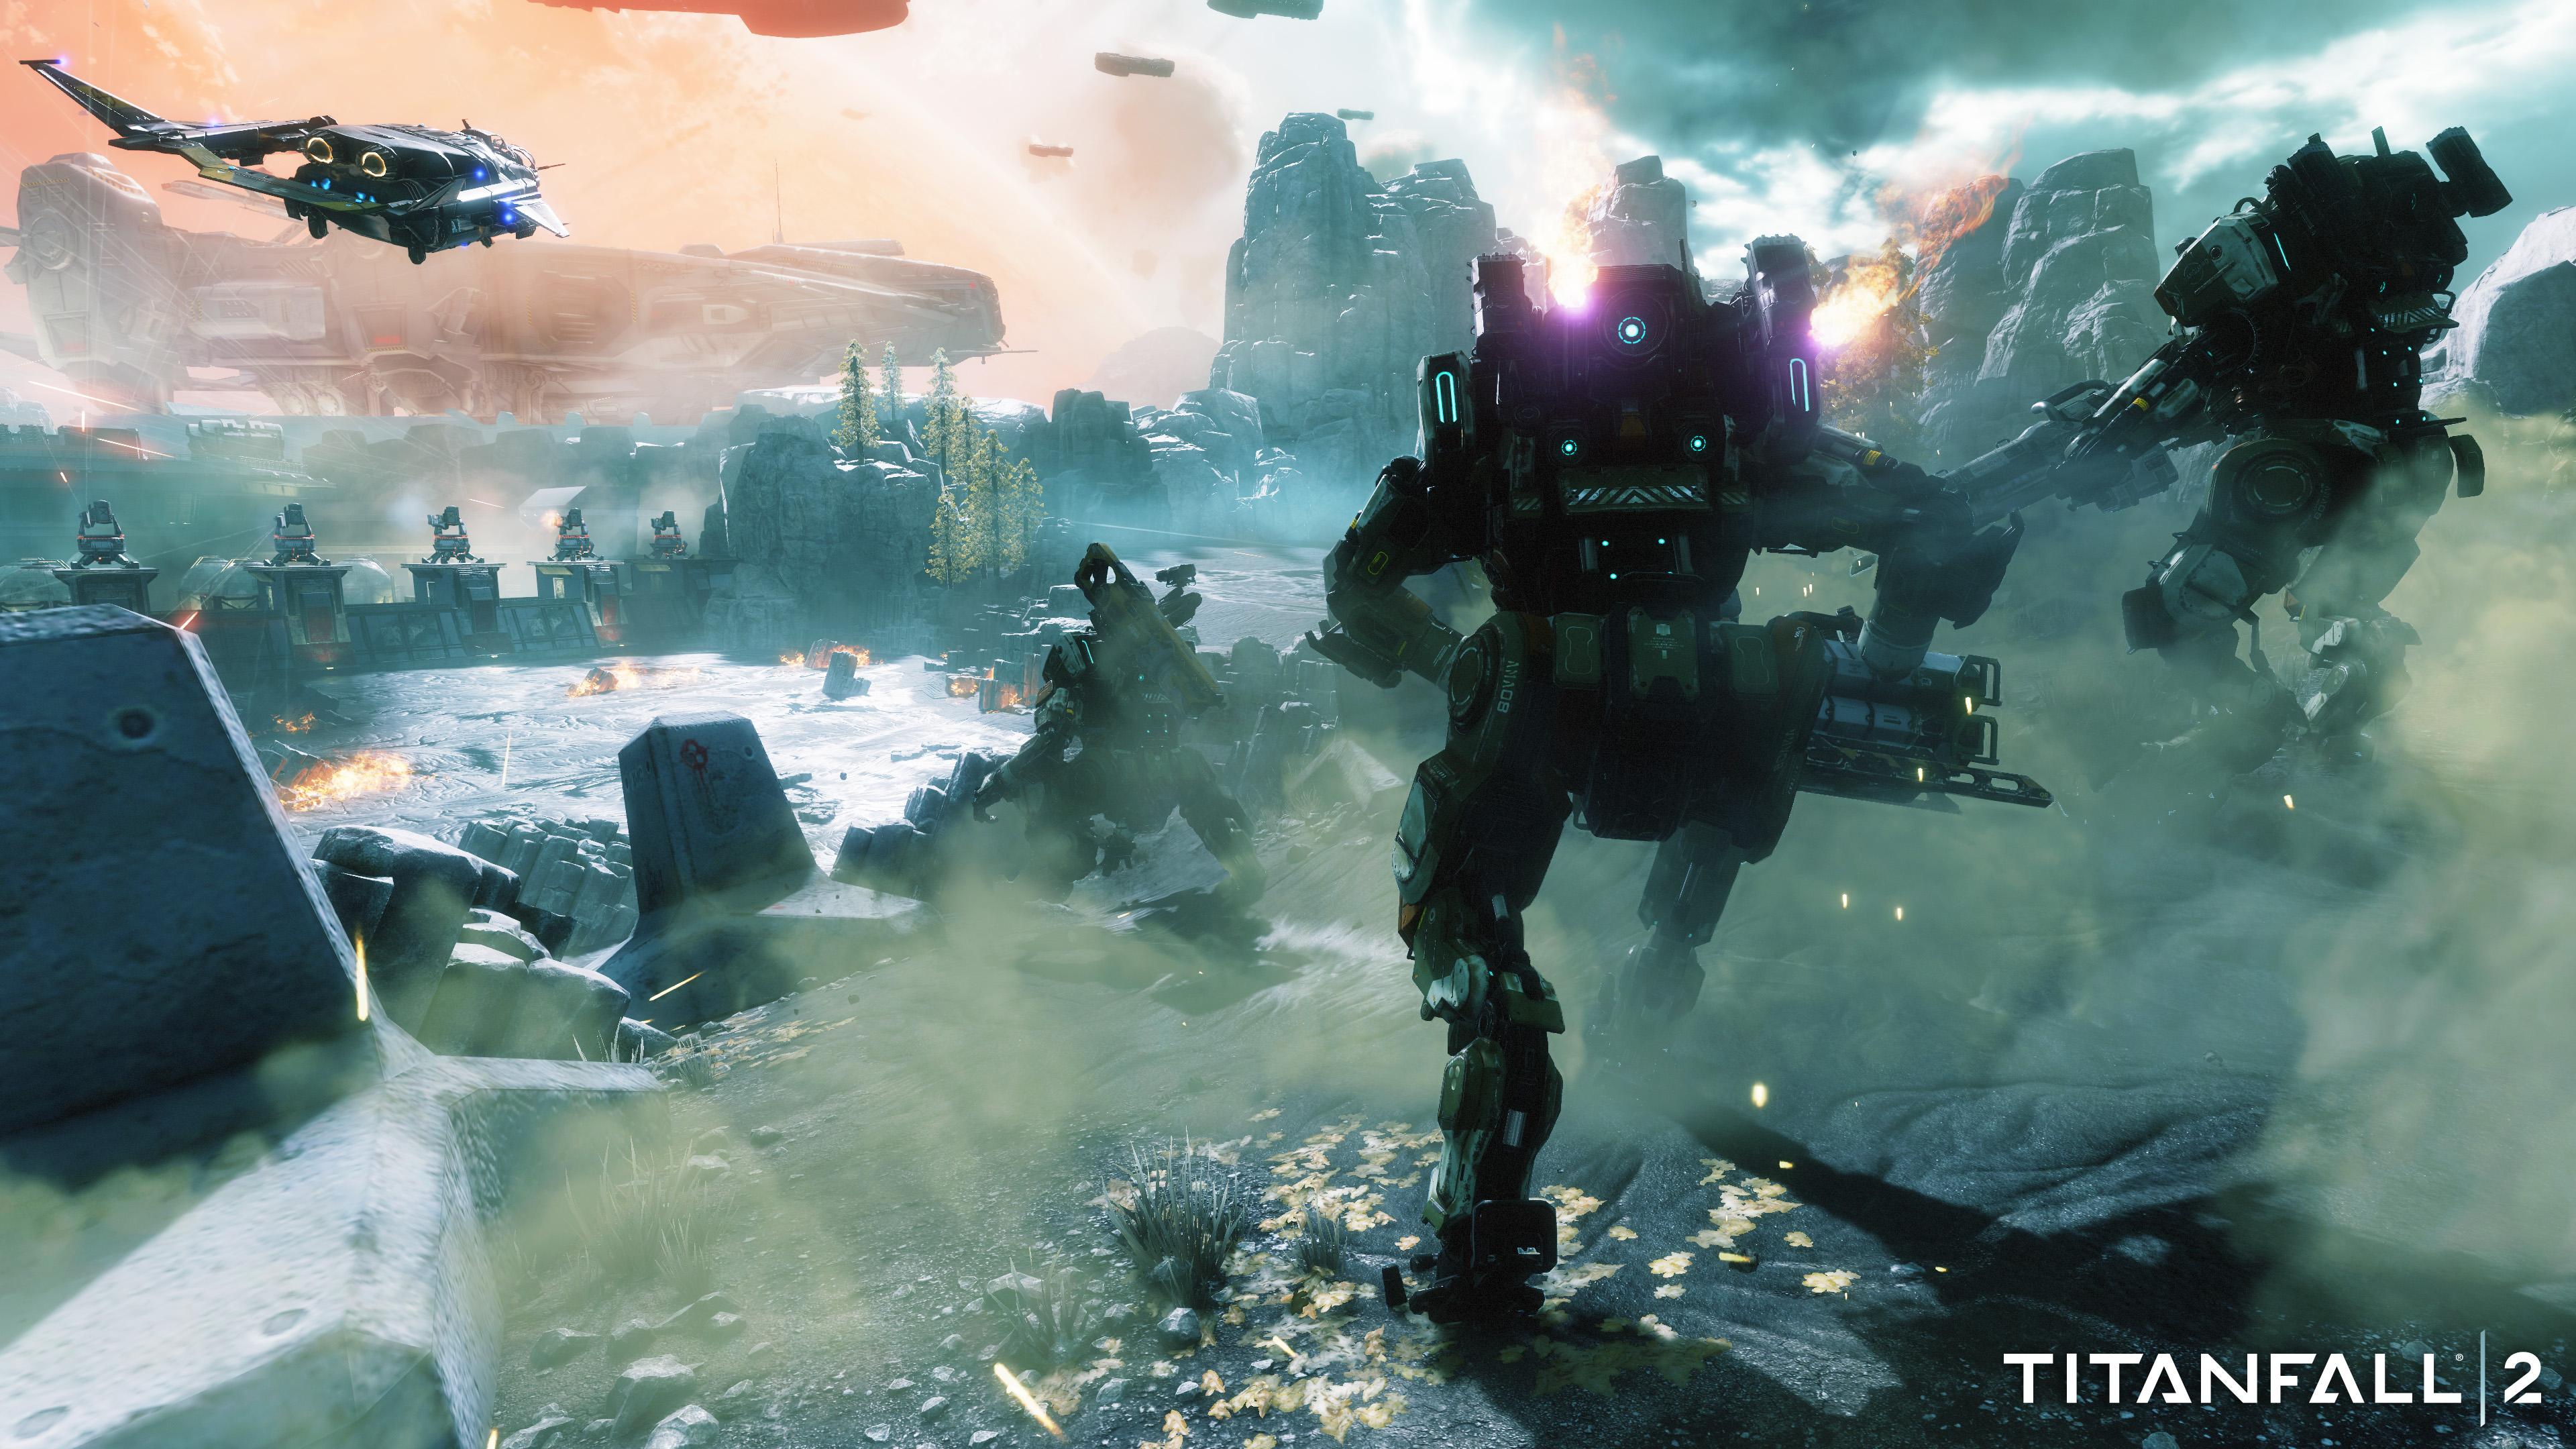 Titanfall 2 - Screenshot 4K